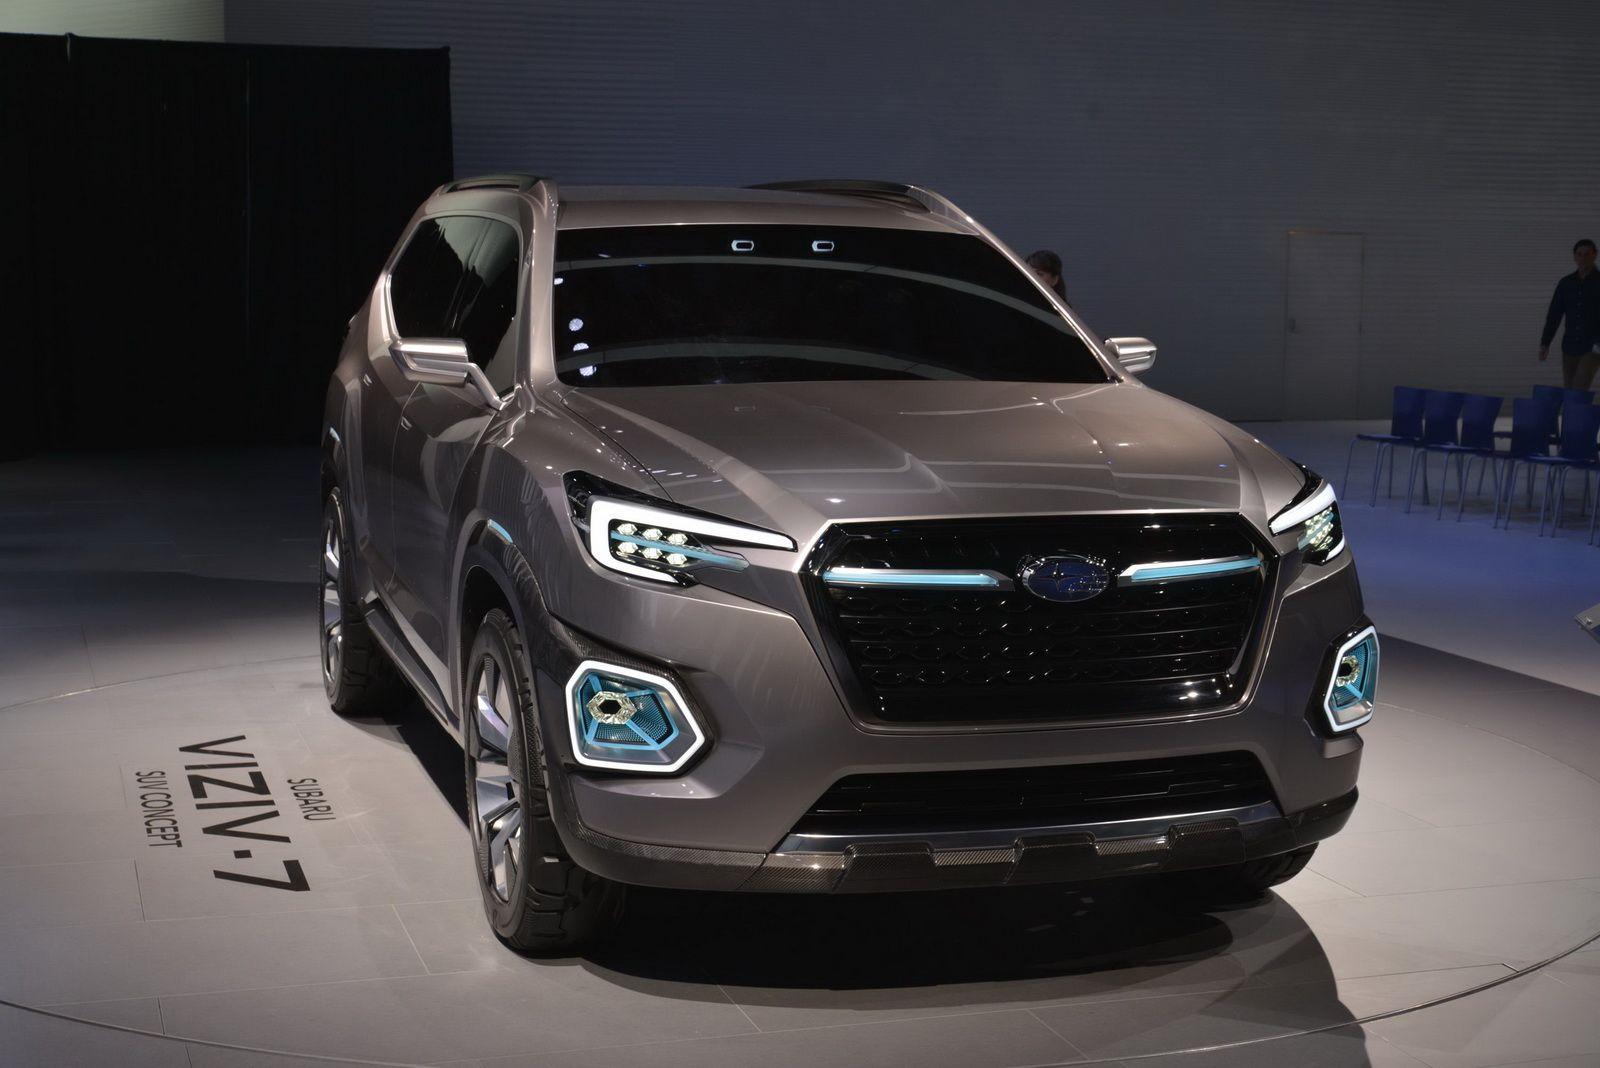 Subaru Viziv 7 Is A Map Of Things To Come W Videos Carscoops In 2020 Subaru Subaru Baja Subaru Cars